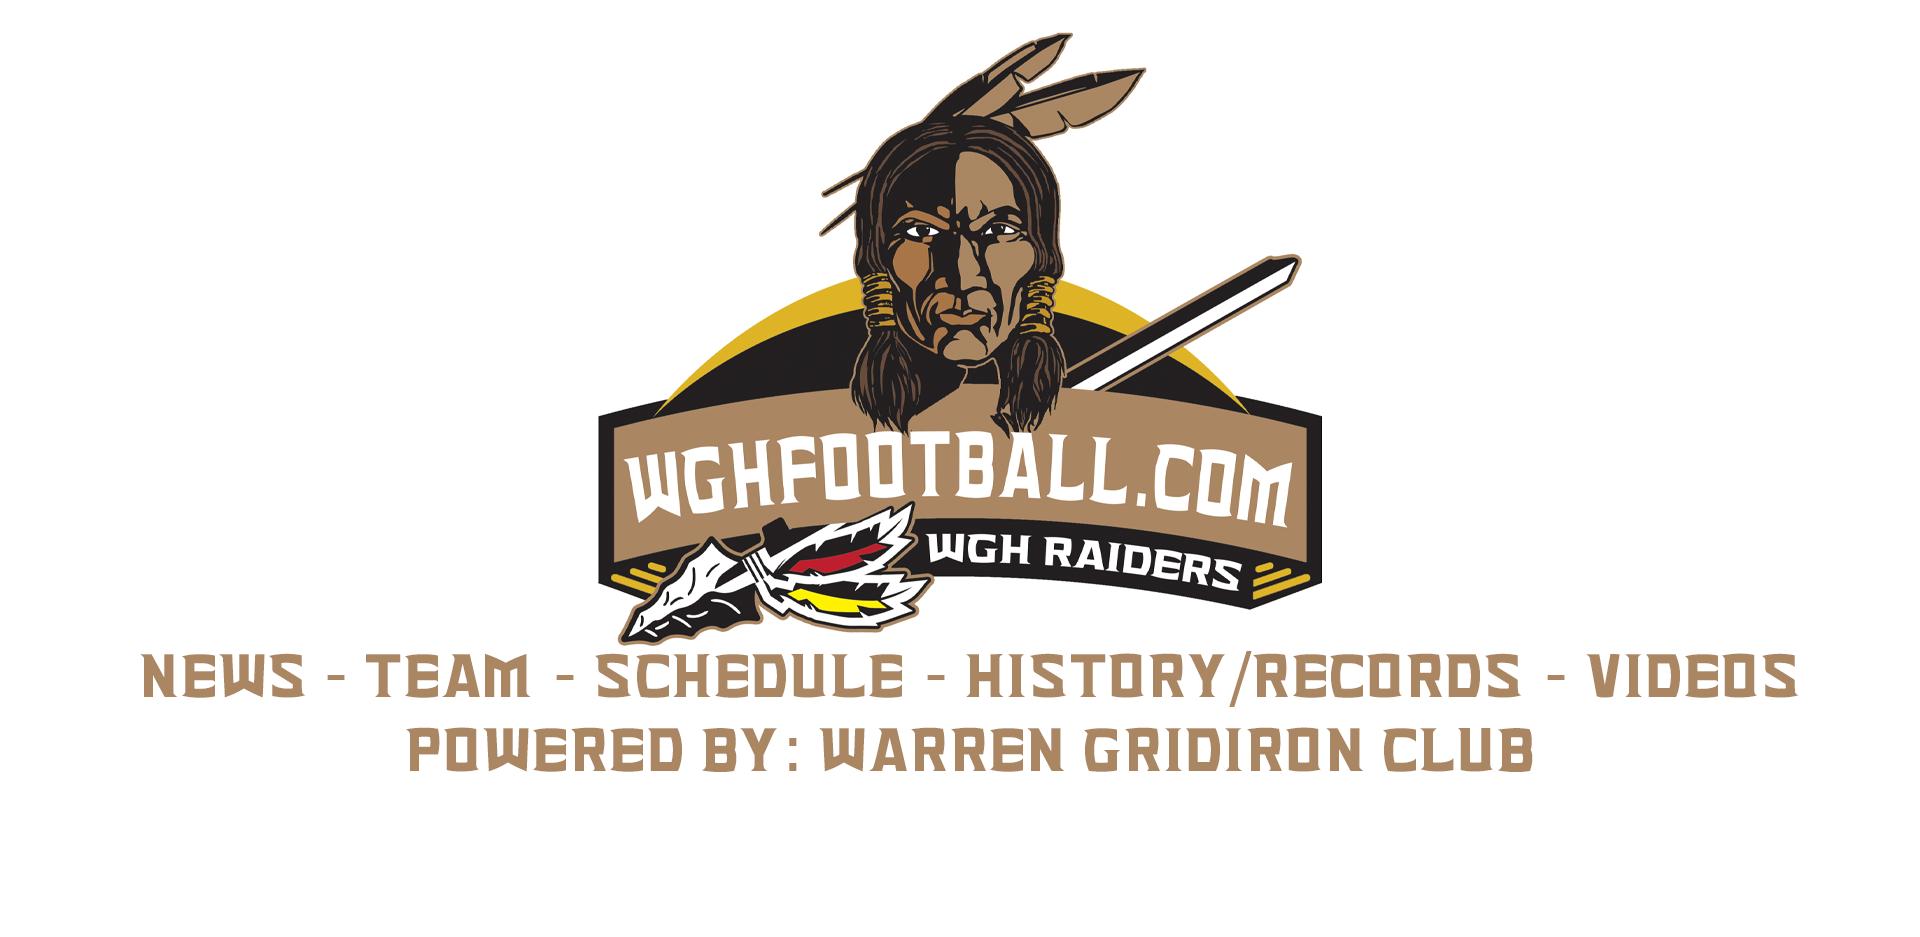 www.wghfootball.com